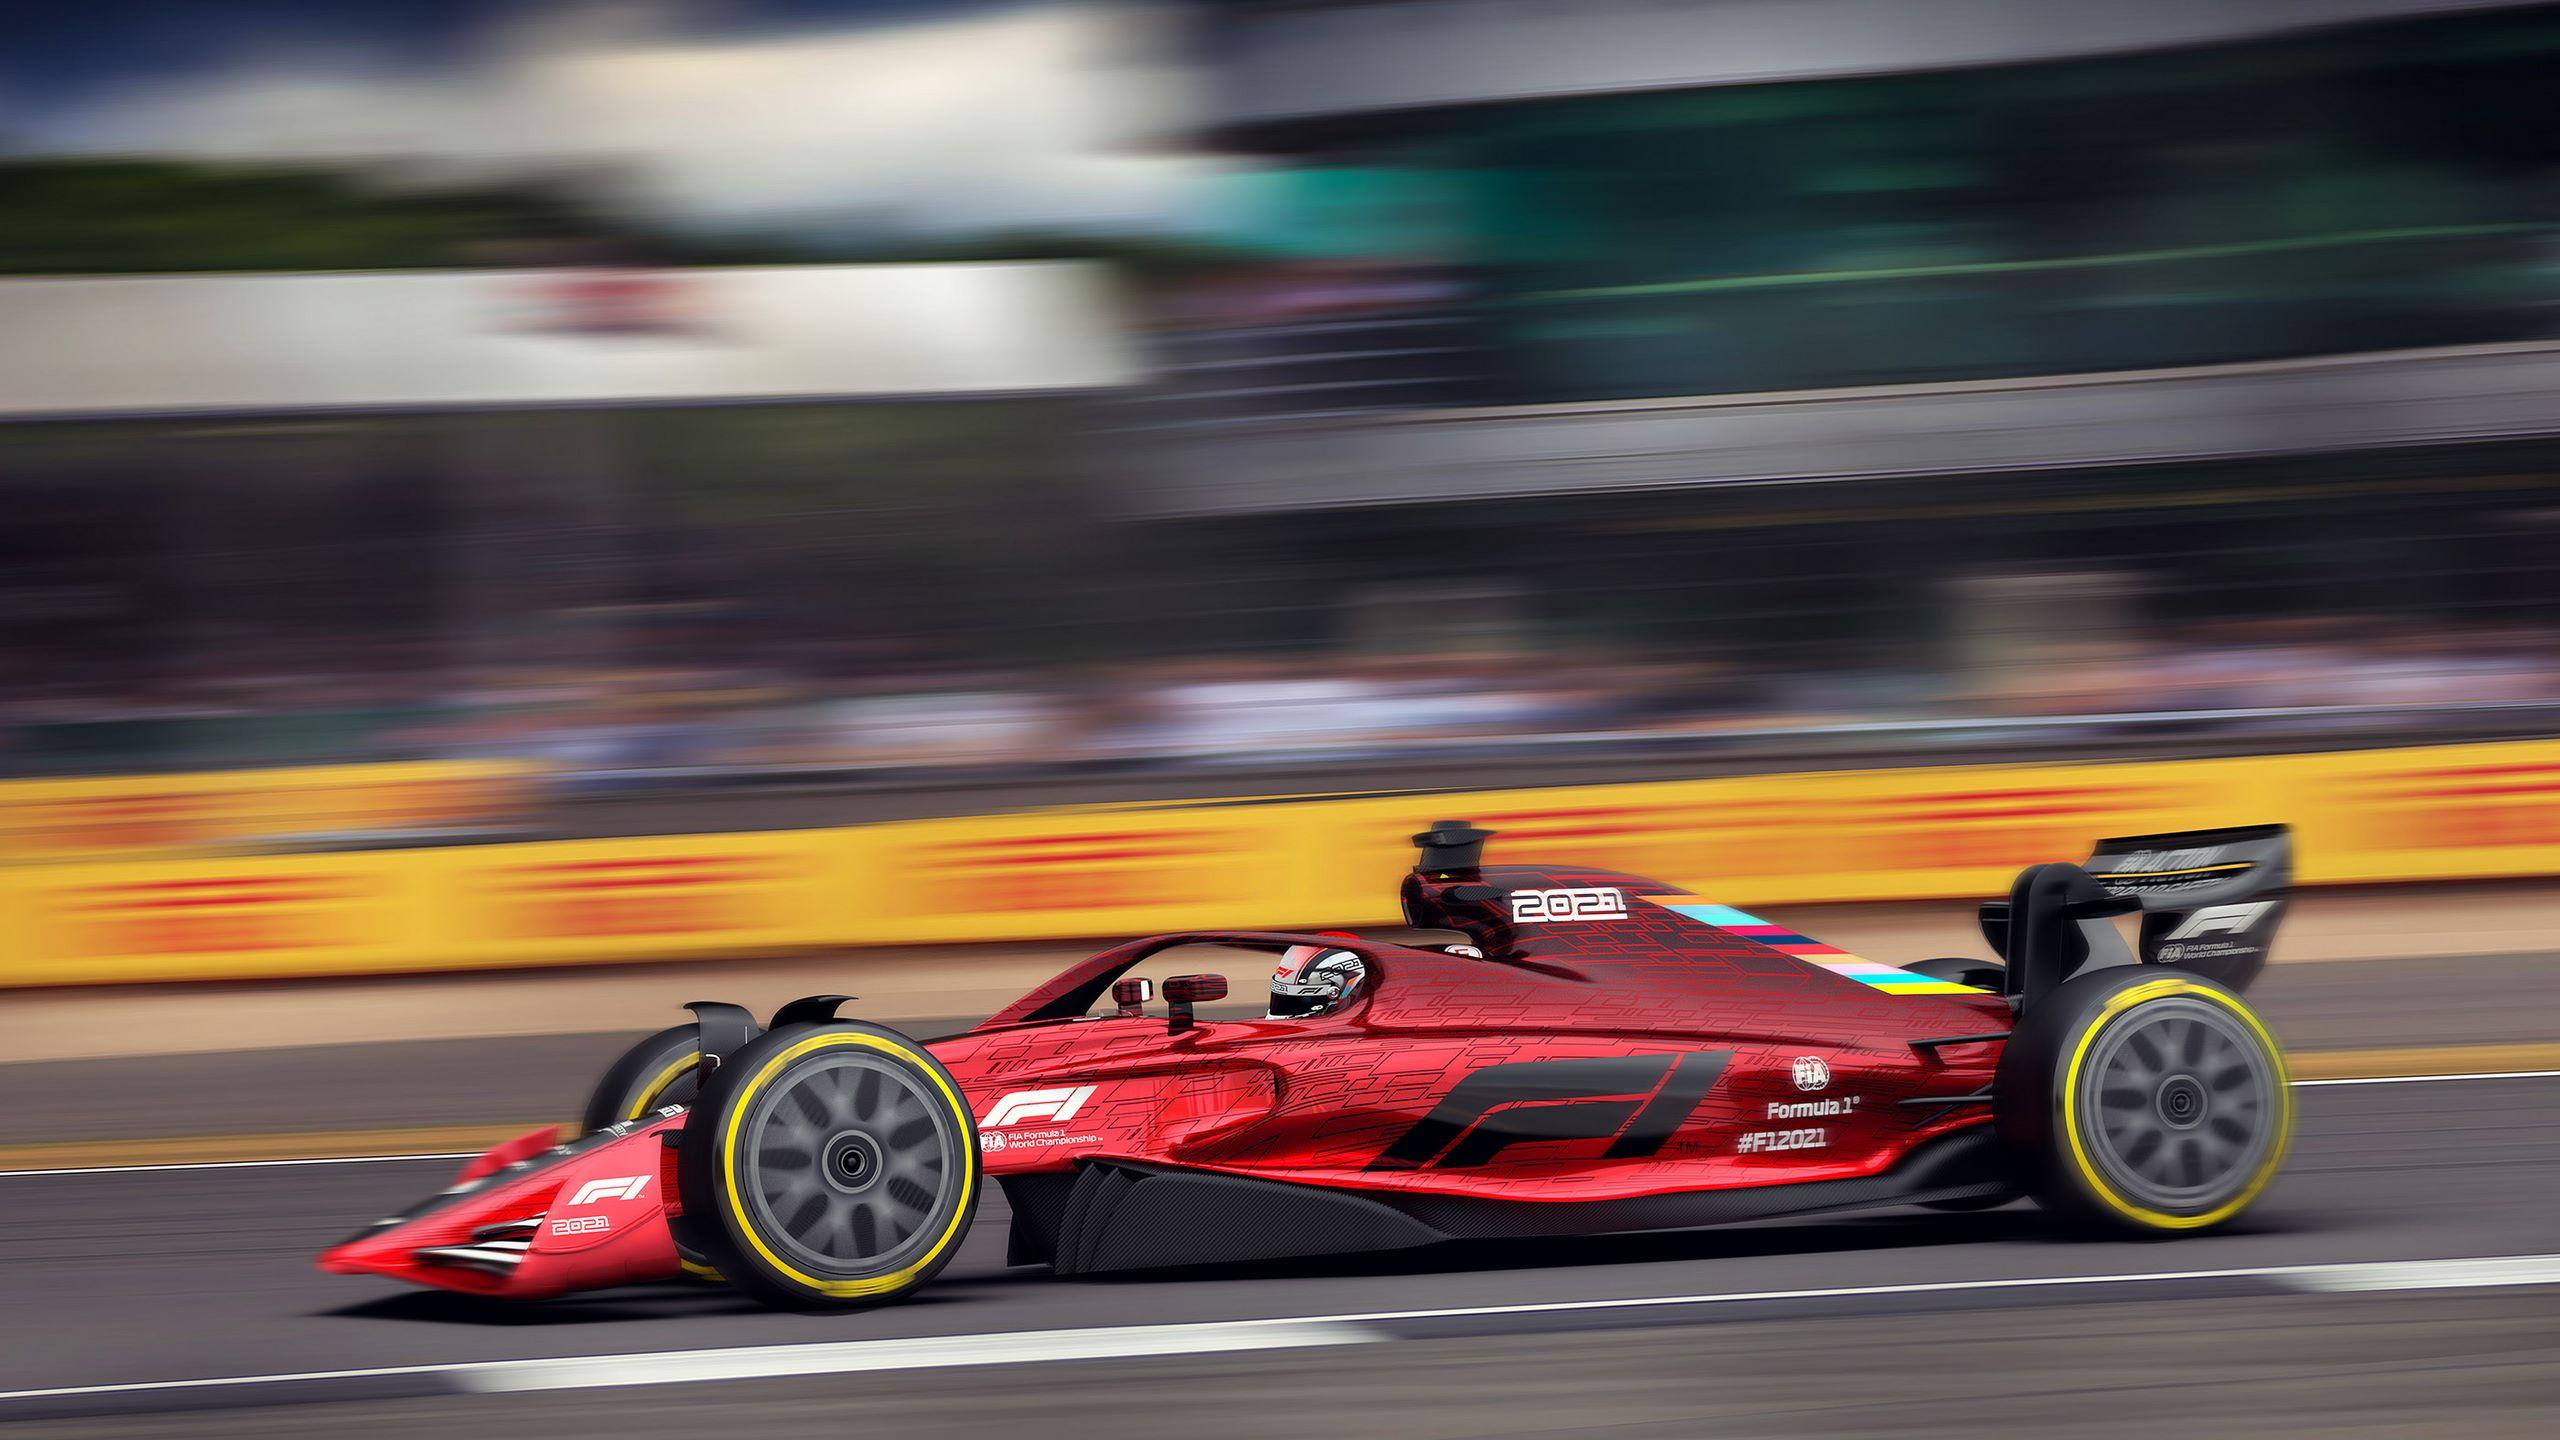 2021-formula-1-race-car-rendering f1 (15)